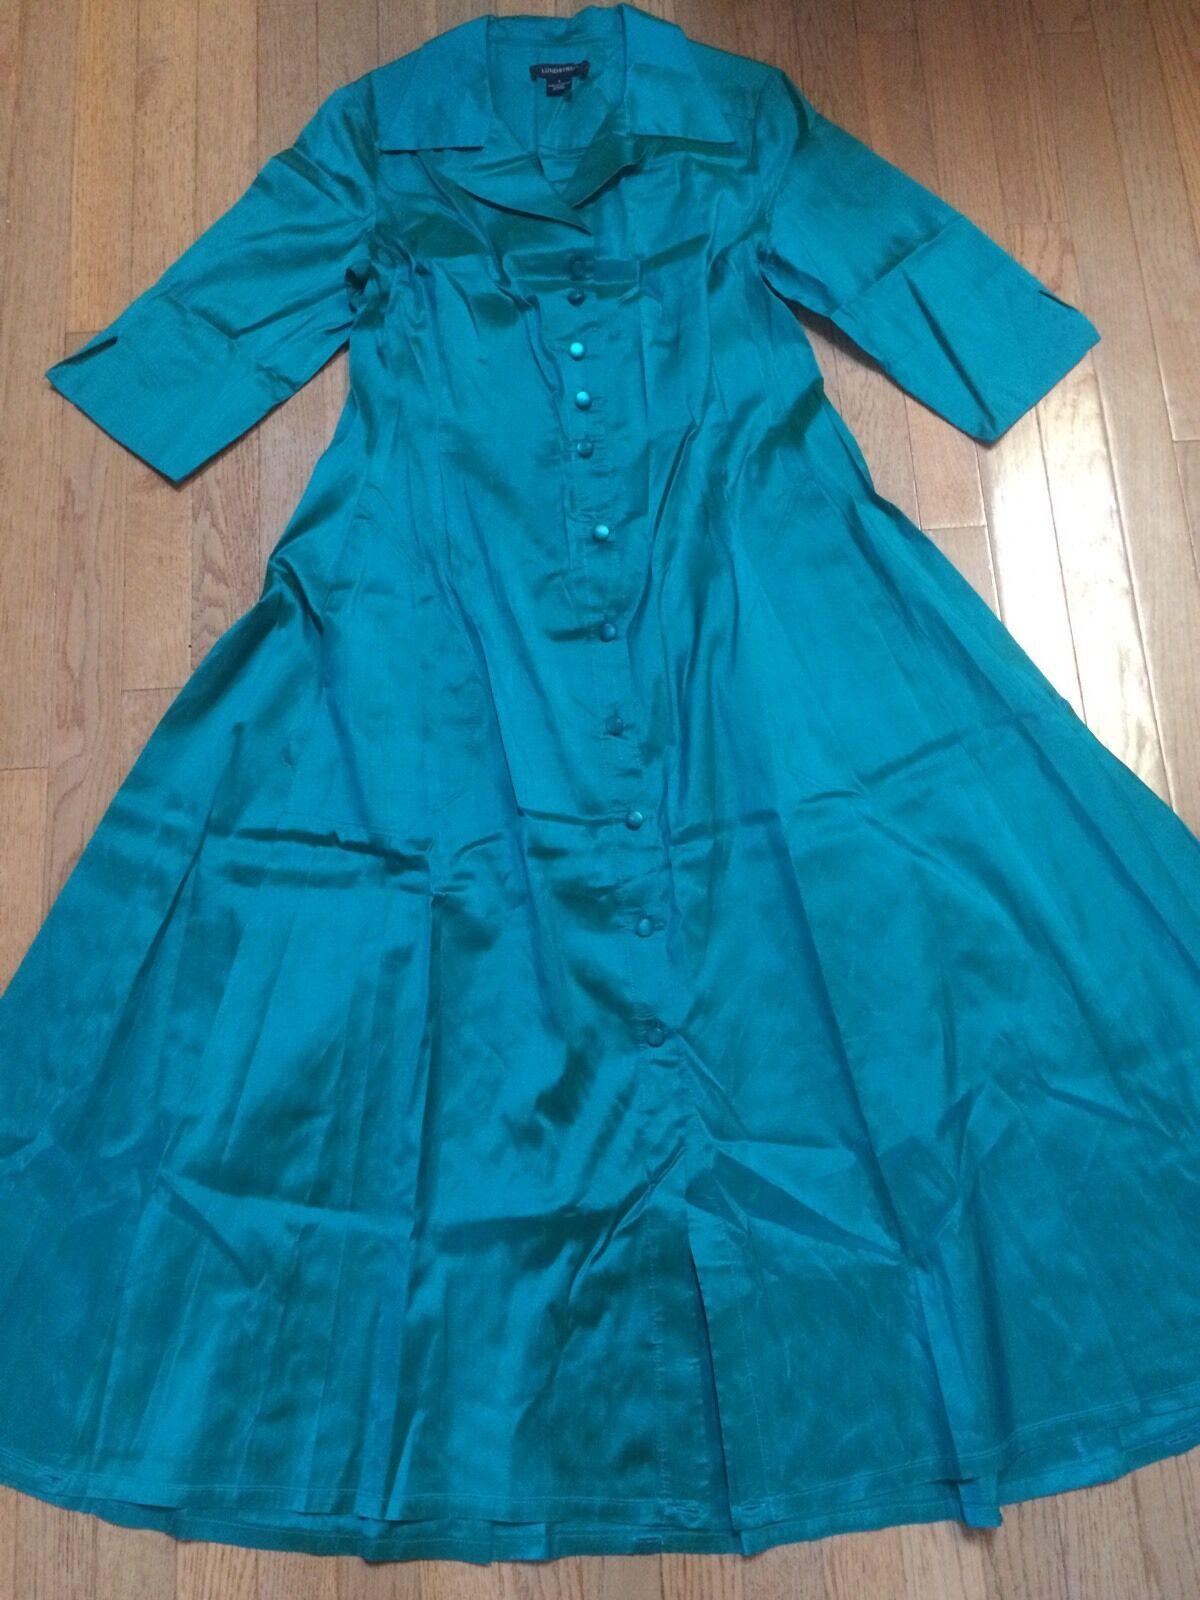 Lundstrom Women's 100% Silk Dress Size 8